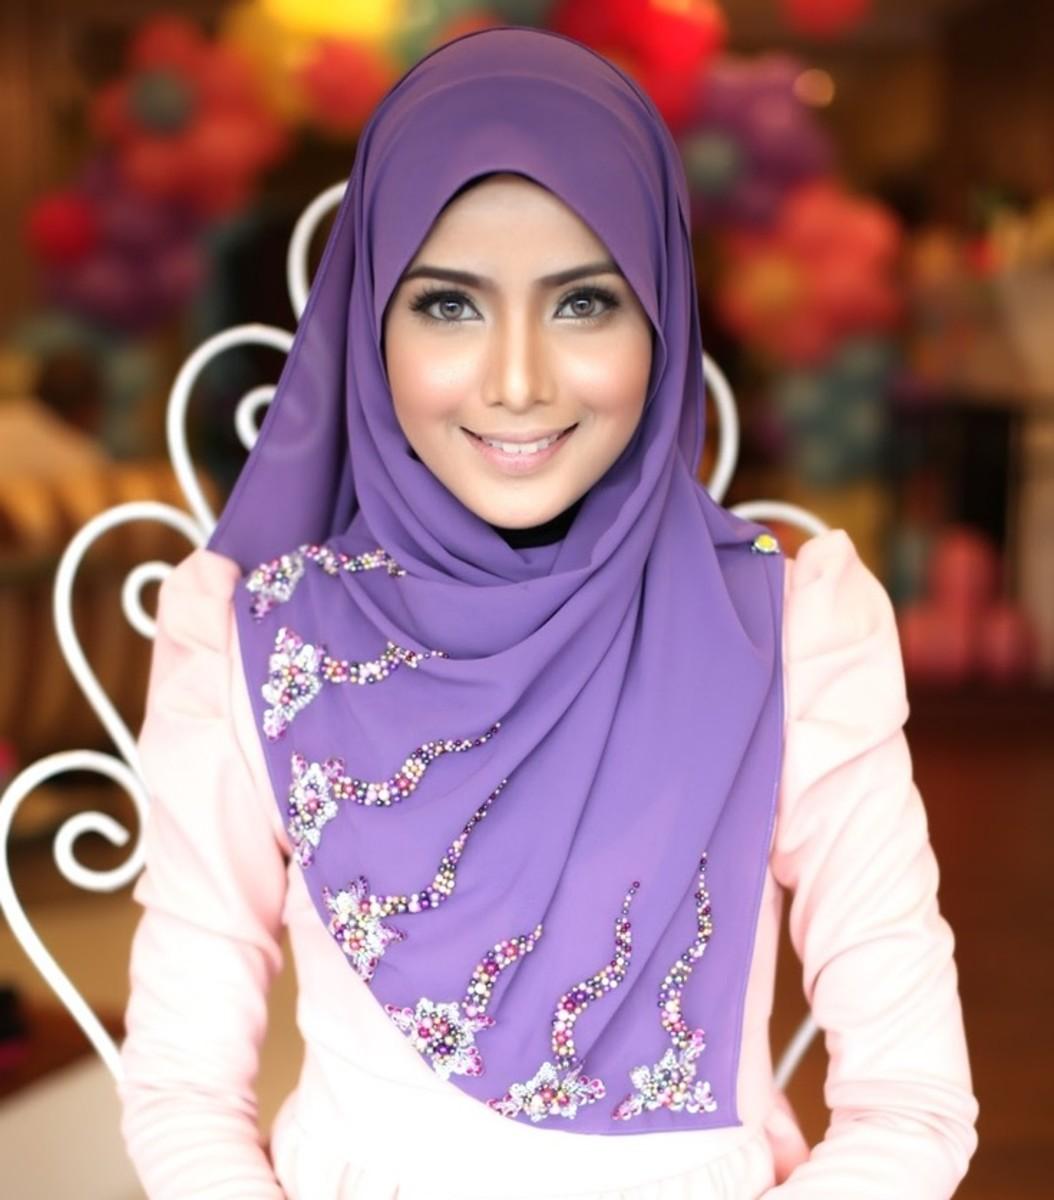 Purple hijab scarf worn covering her bosom